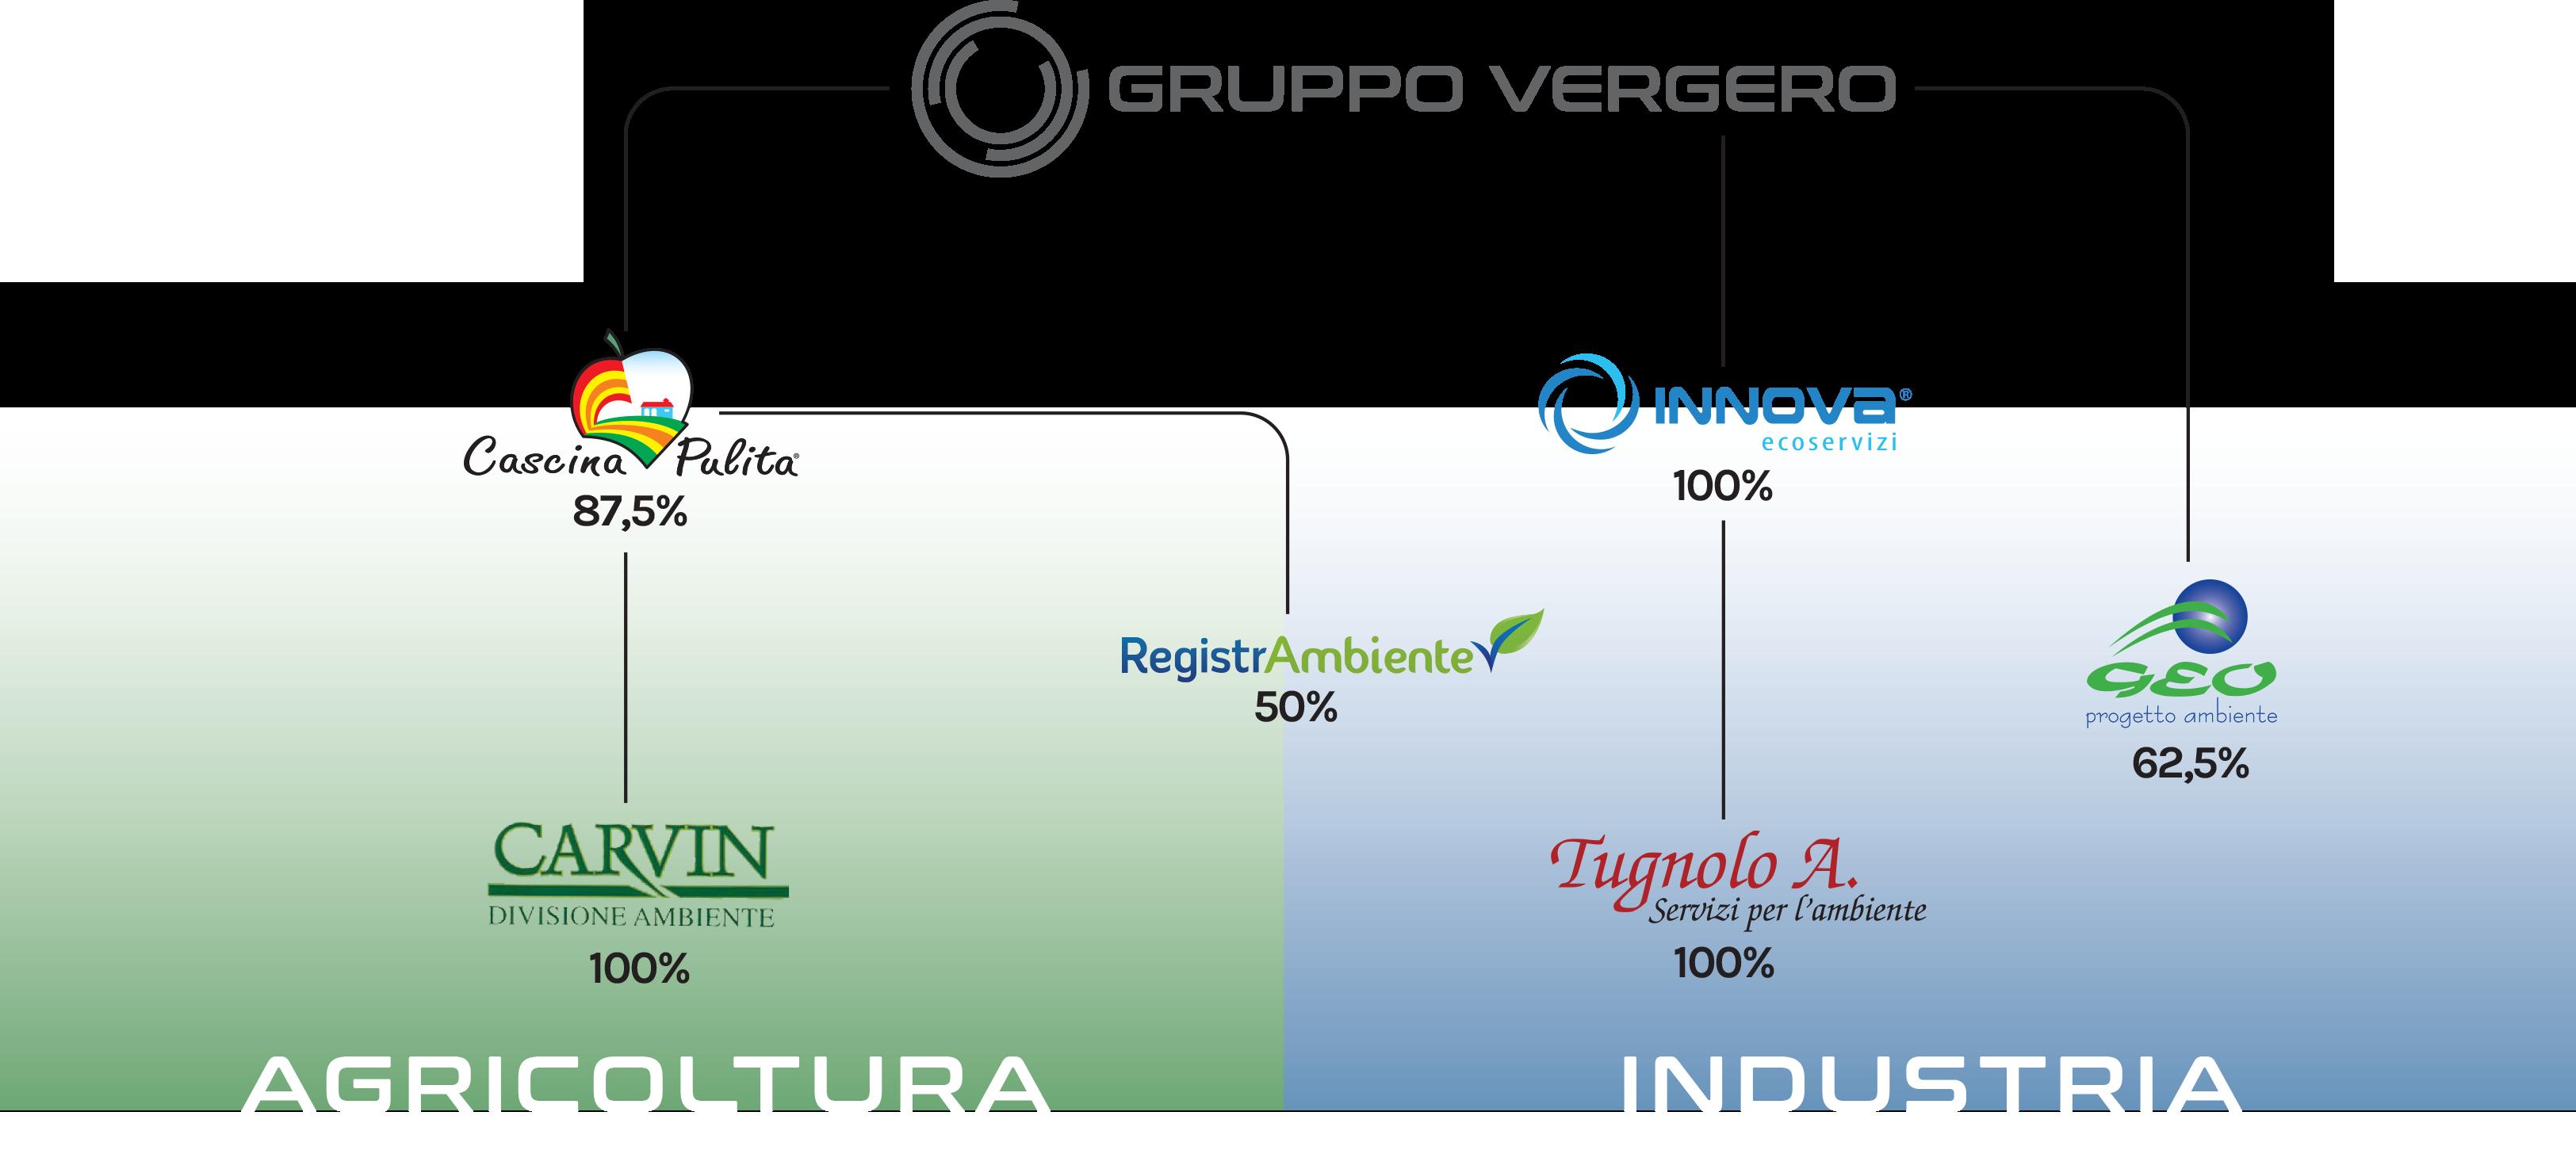 Struttura Societaria - Gruppo Vergero